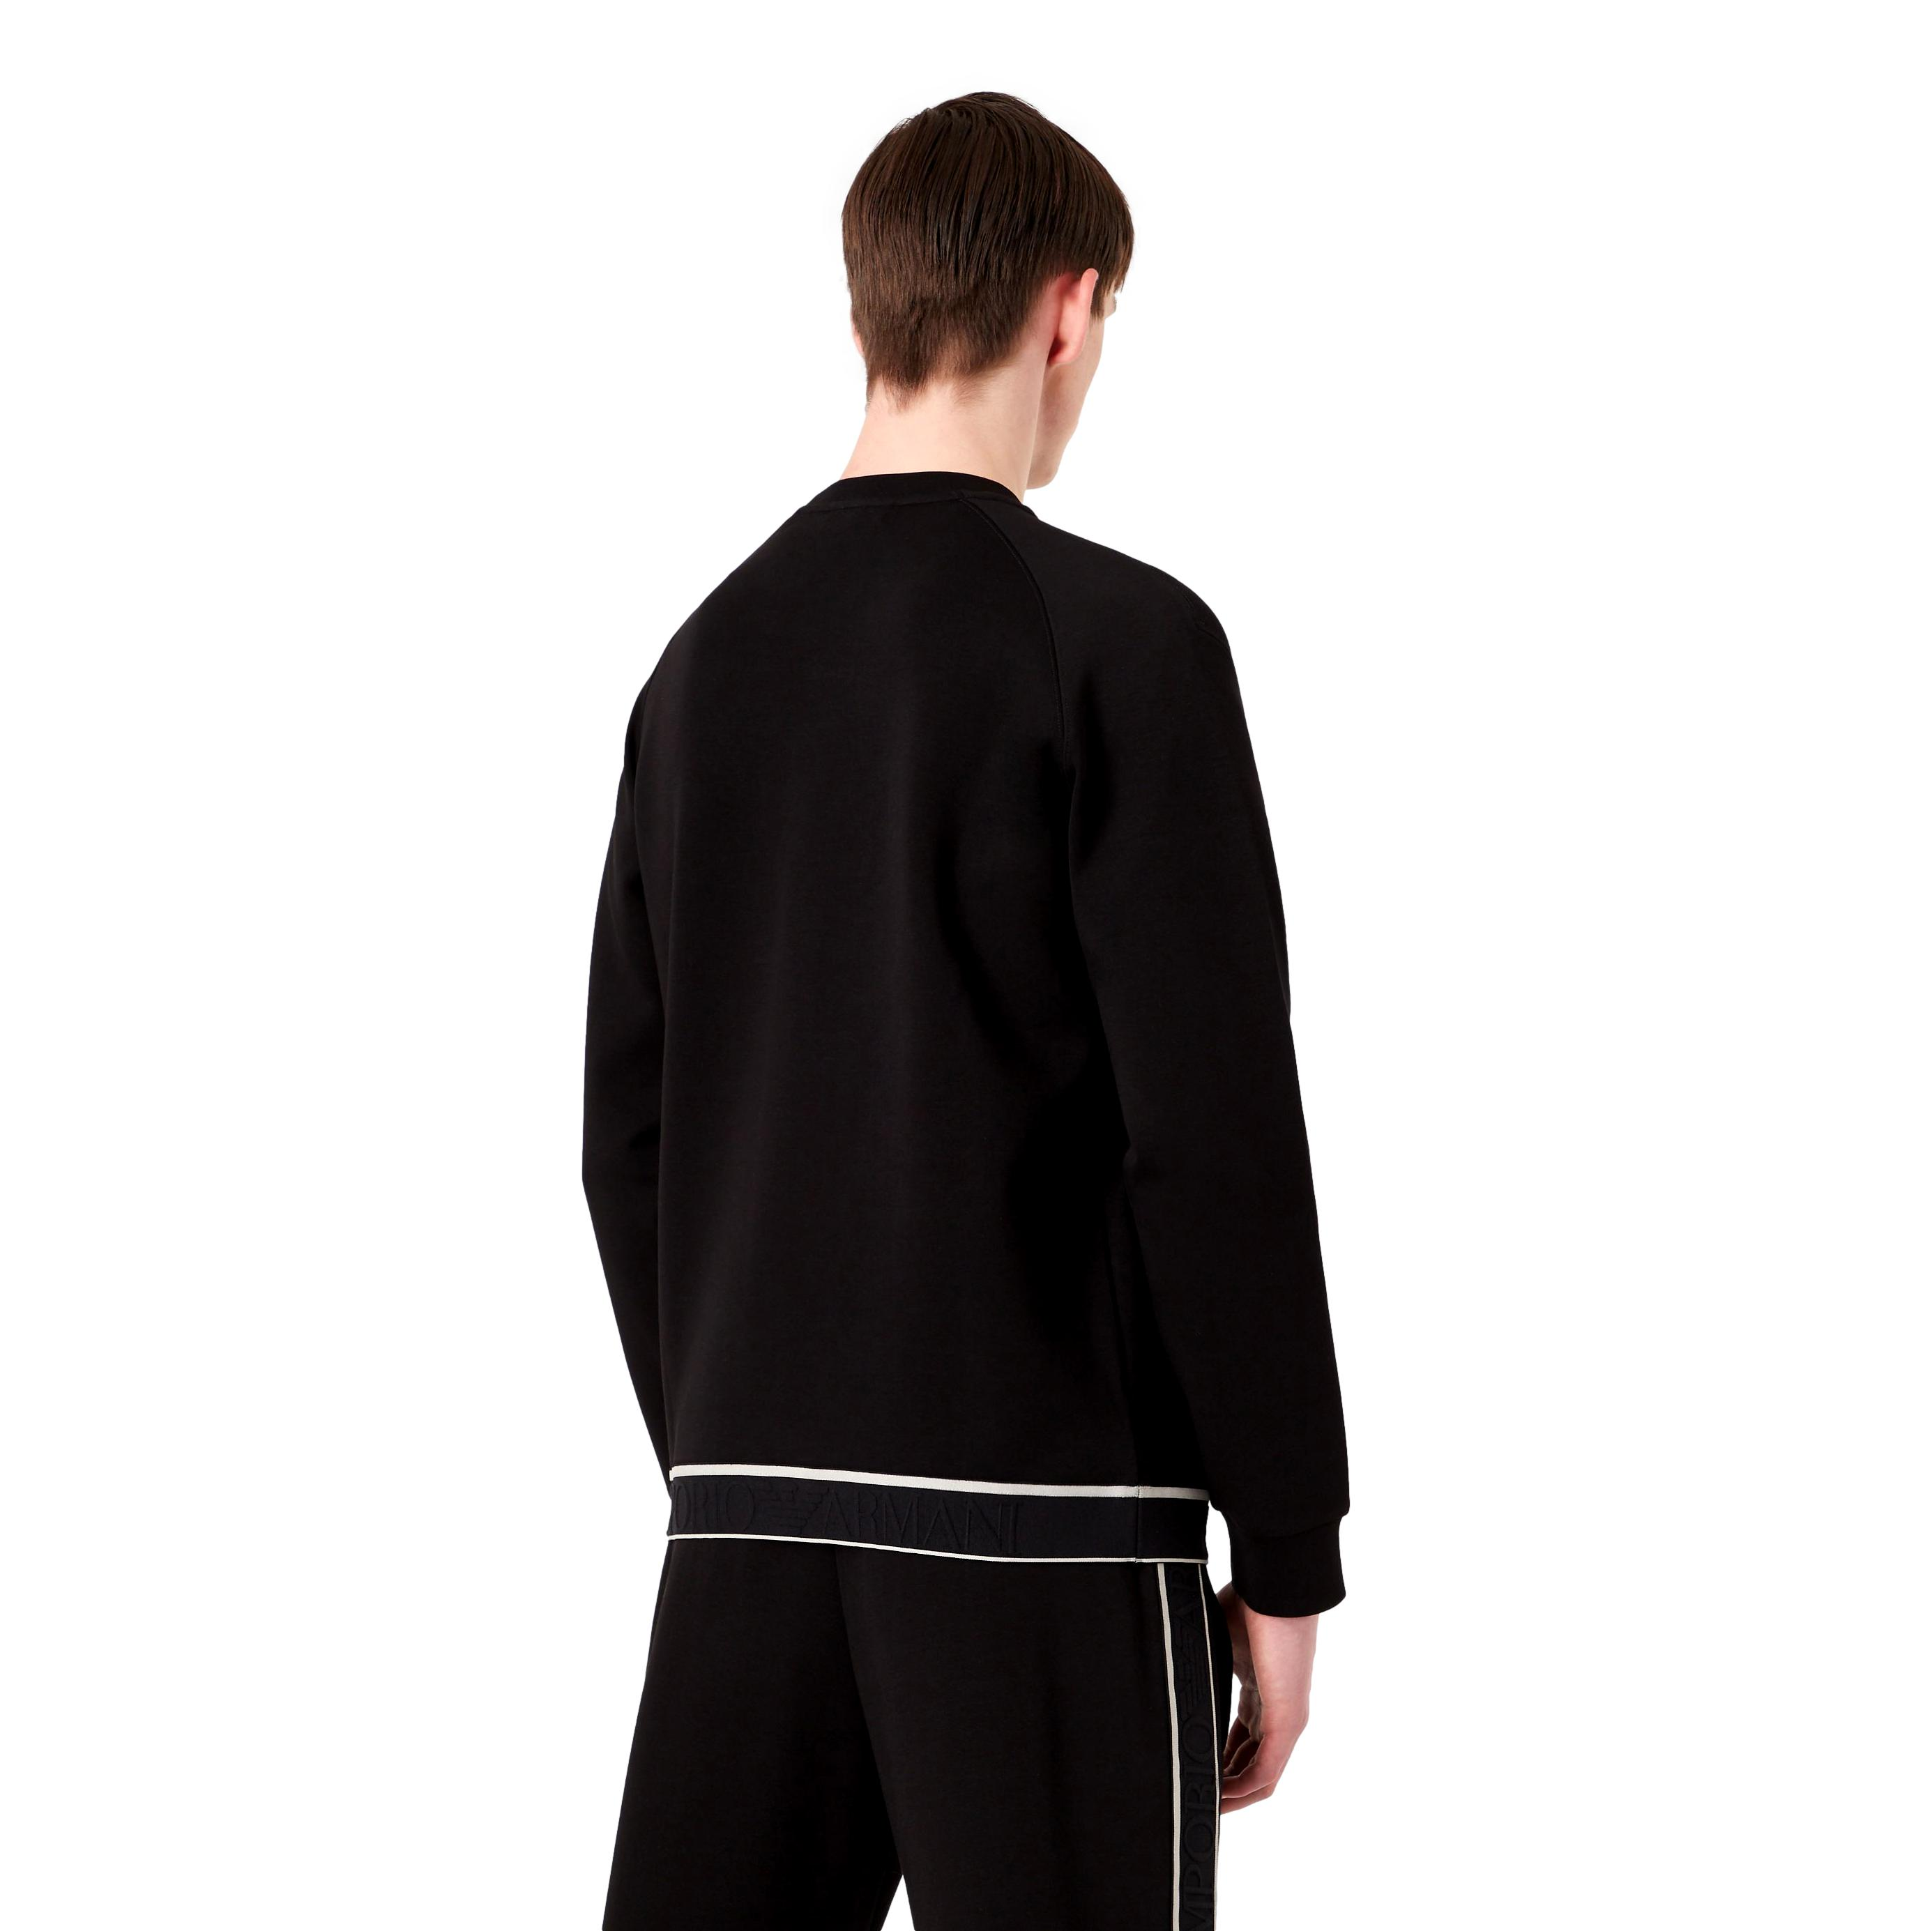 Felpa in double jersey con banda elastica logo jacquard EMPORIO ARMANI | Felpe | 6K1M74 1JHSZ0999